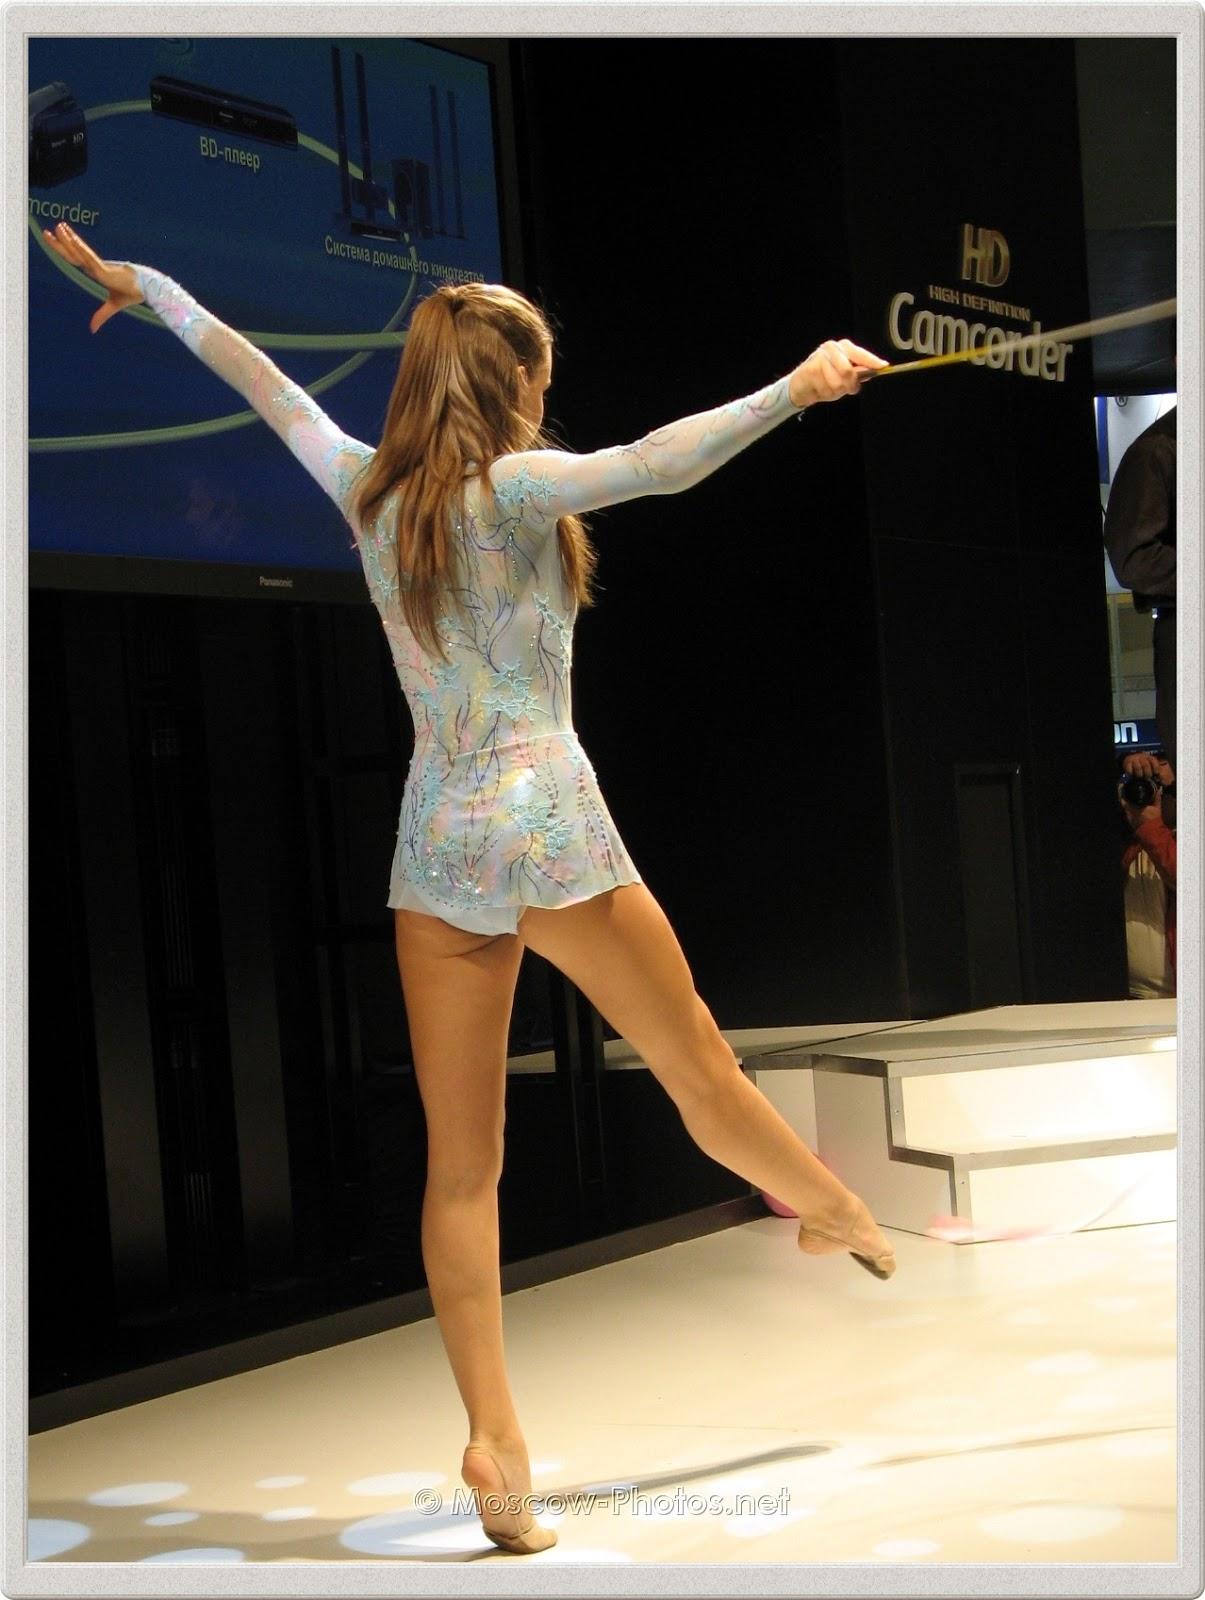 Dancing gymnast at Photoforum - 2008